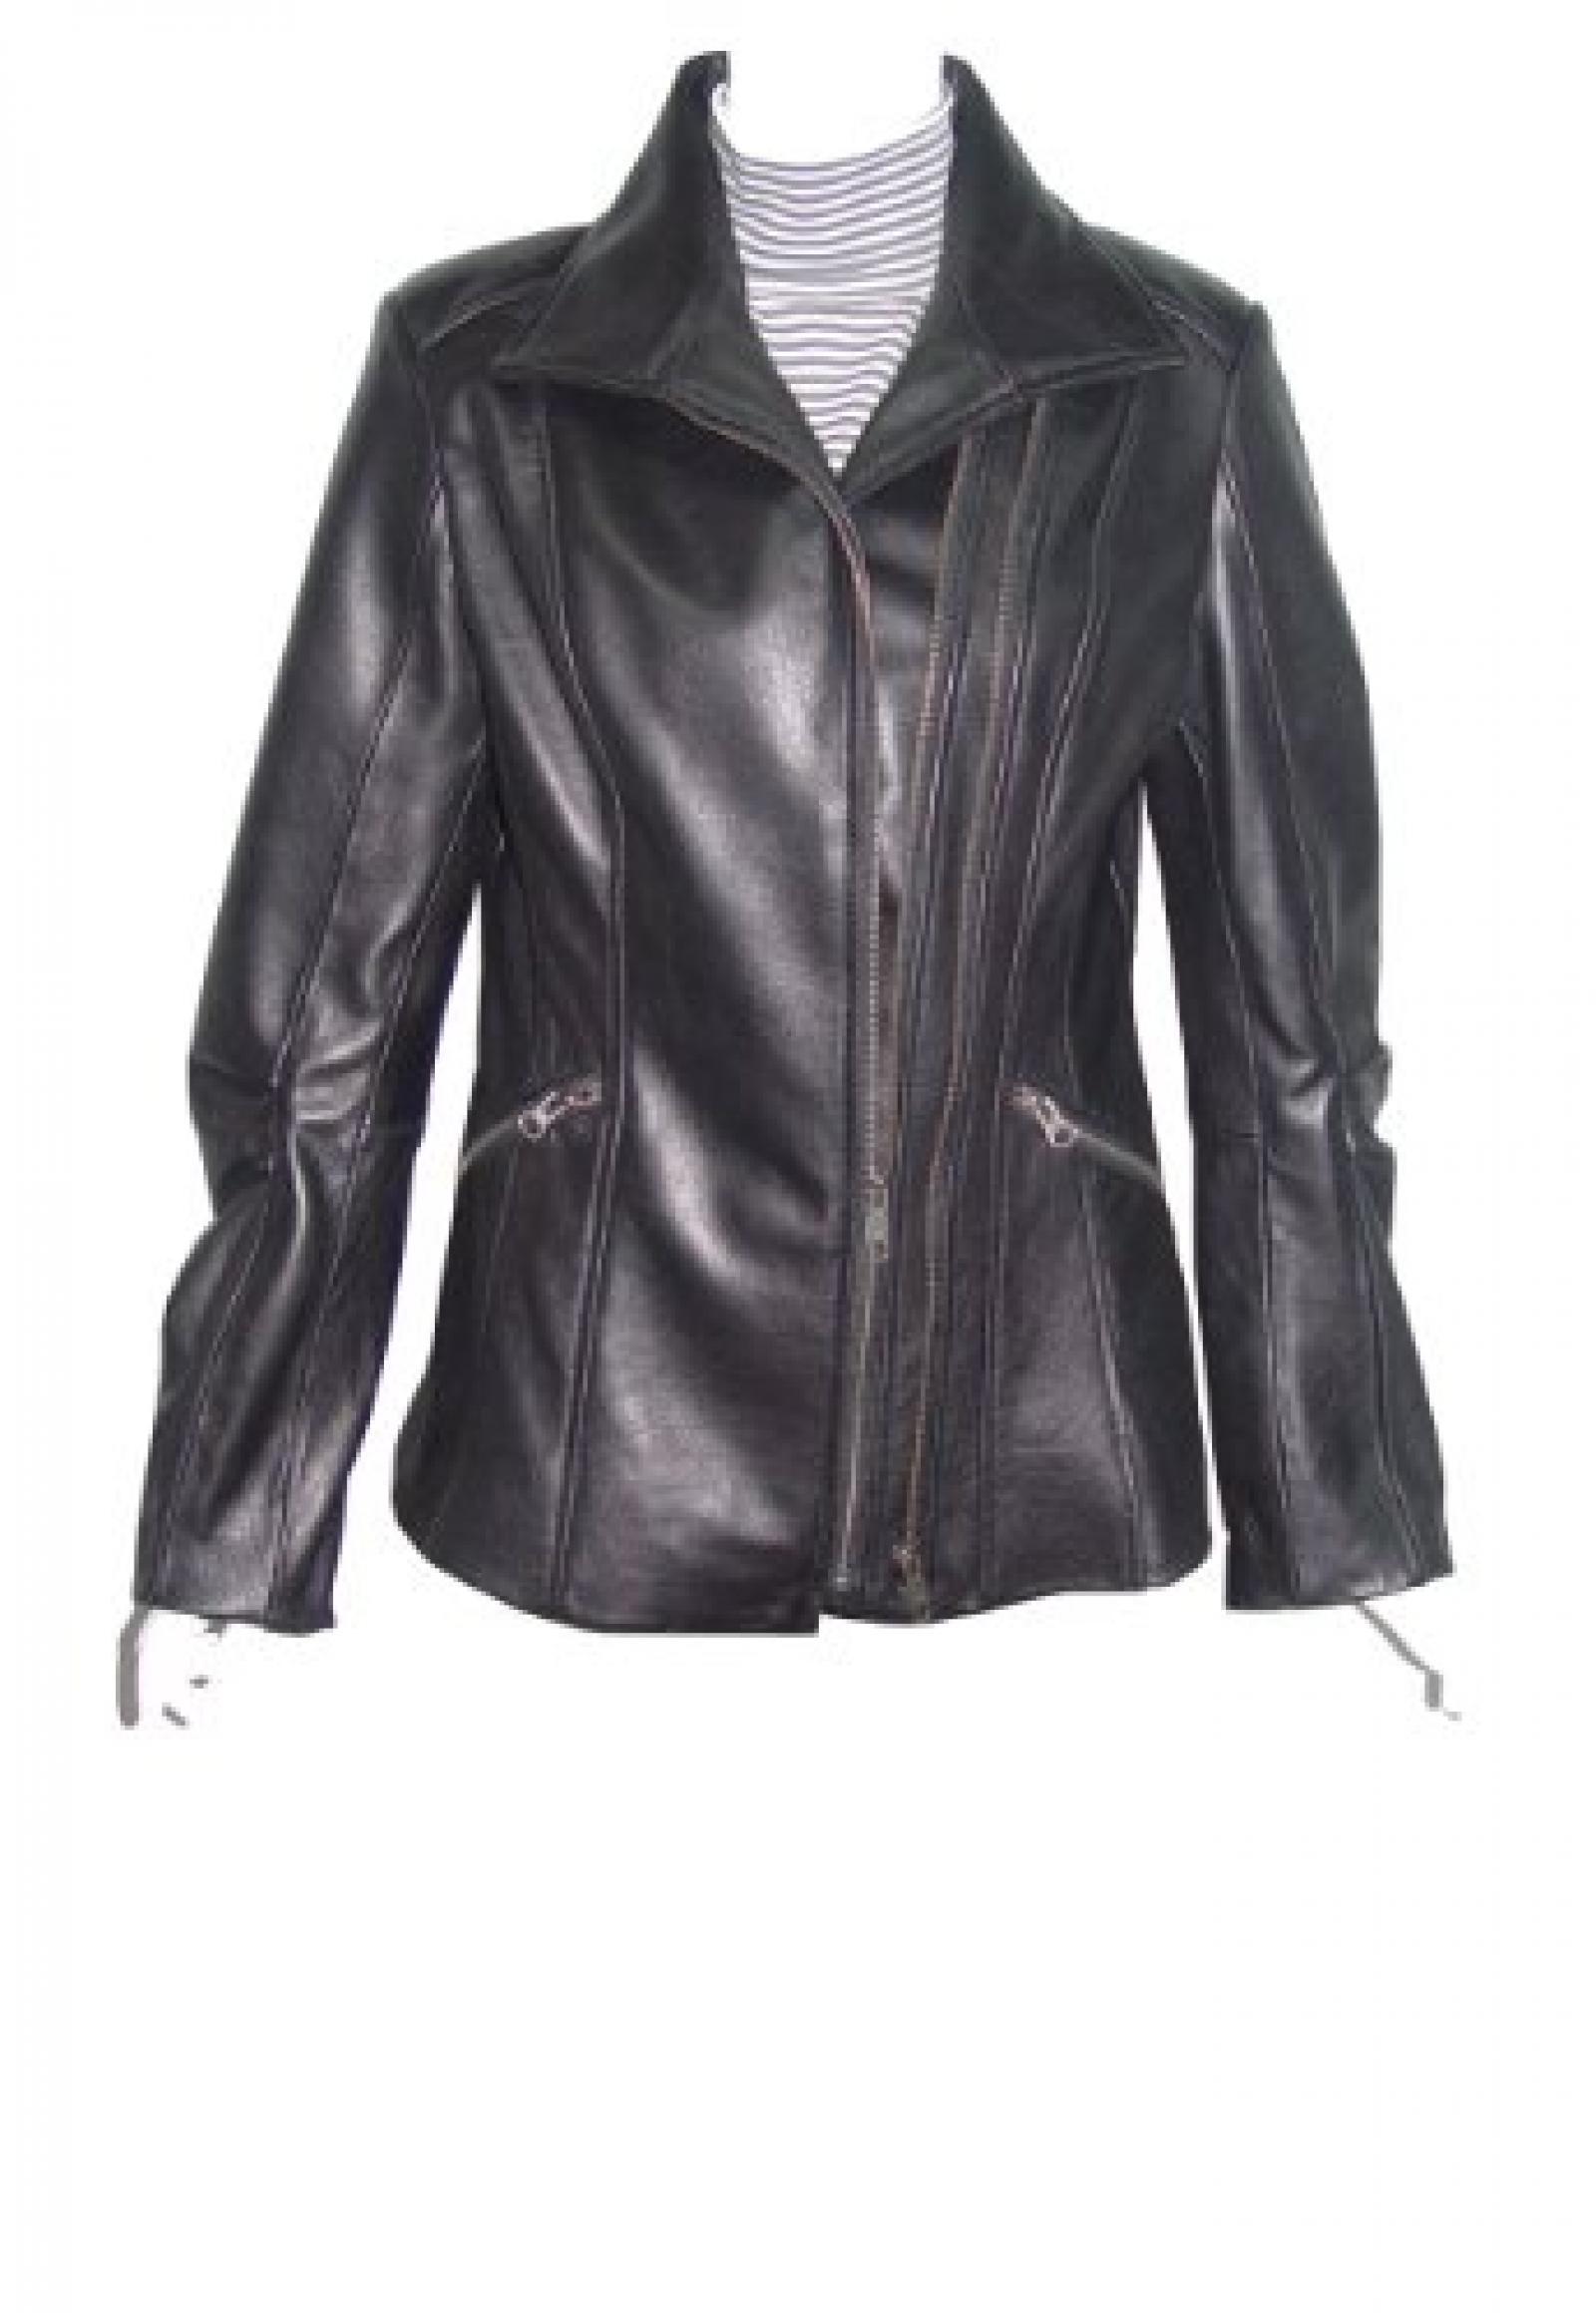 Nettailor Women PETITE SZ 4196 soft Leather Casual Jacket Double Zipped Pocket